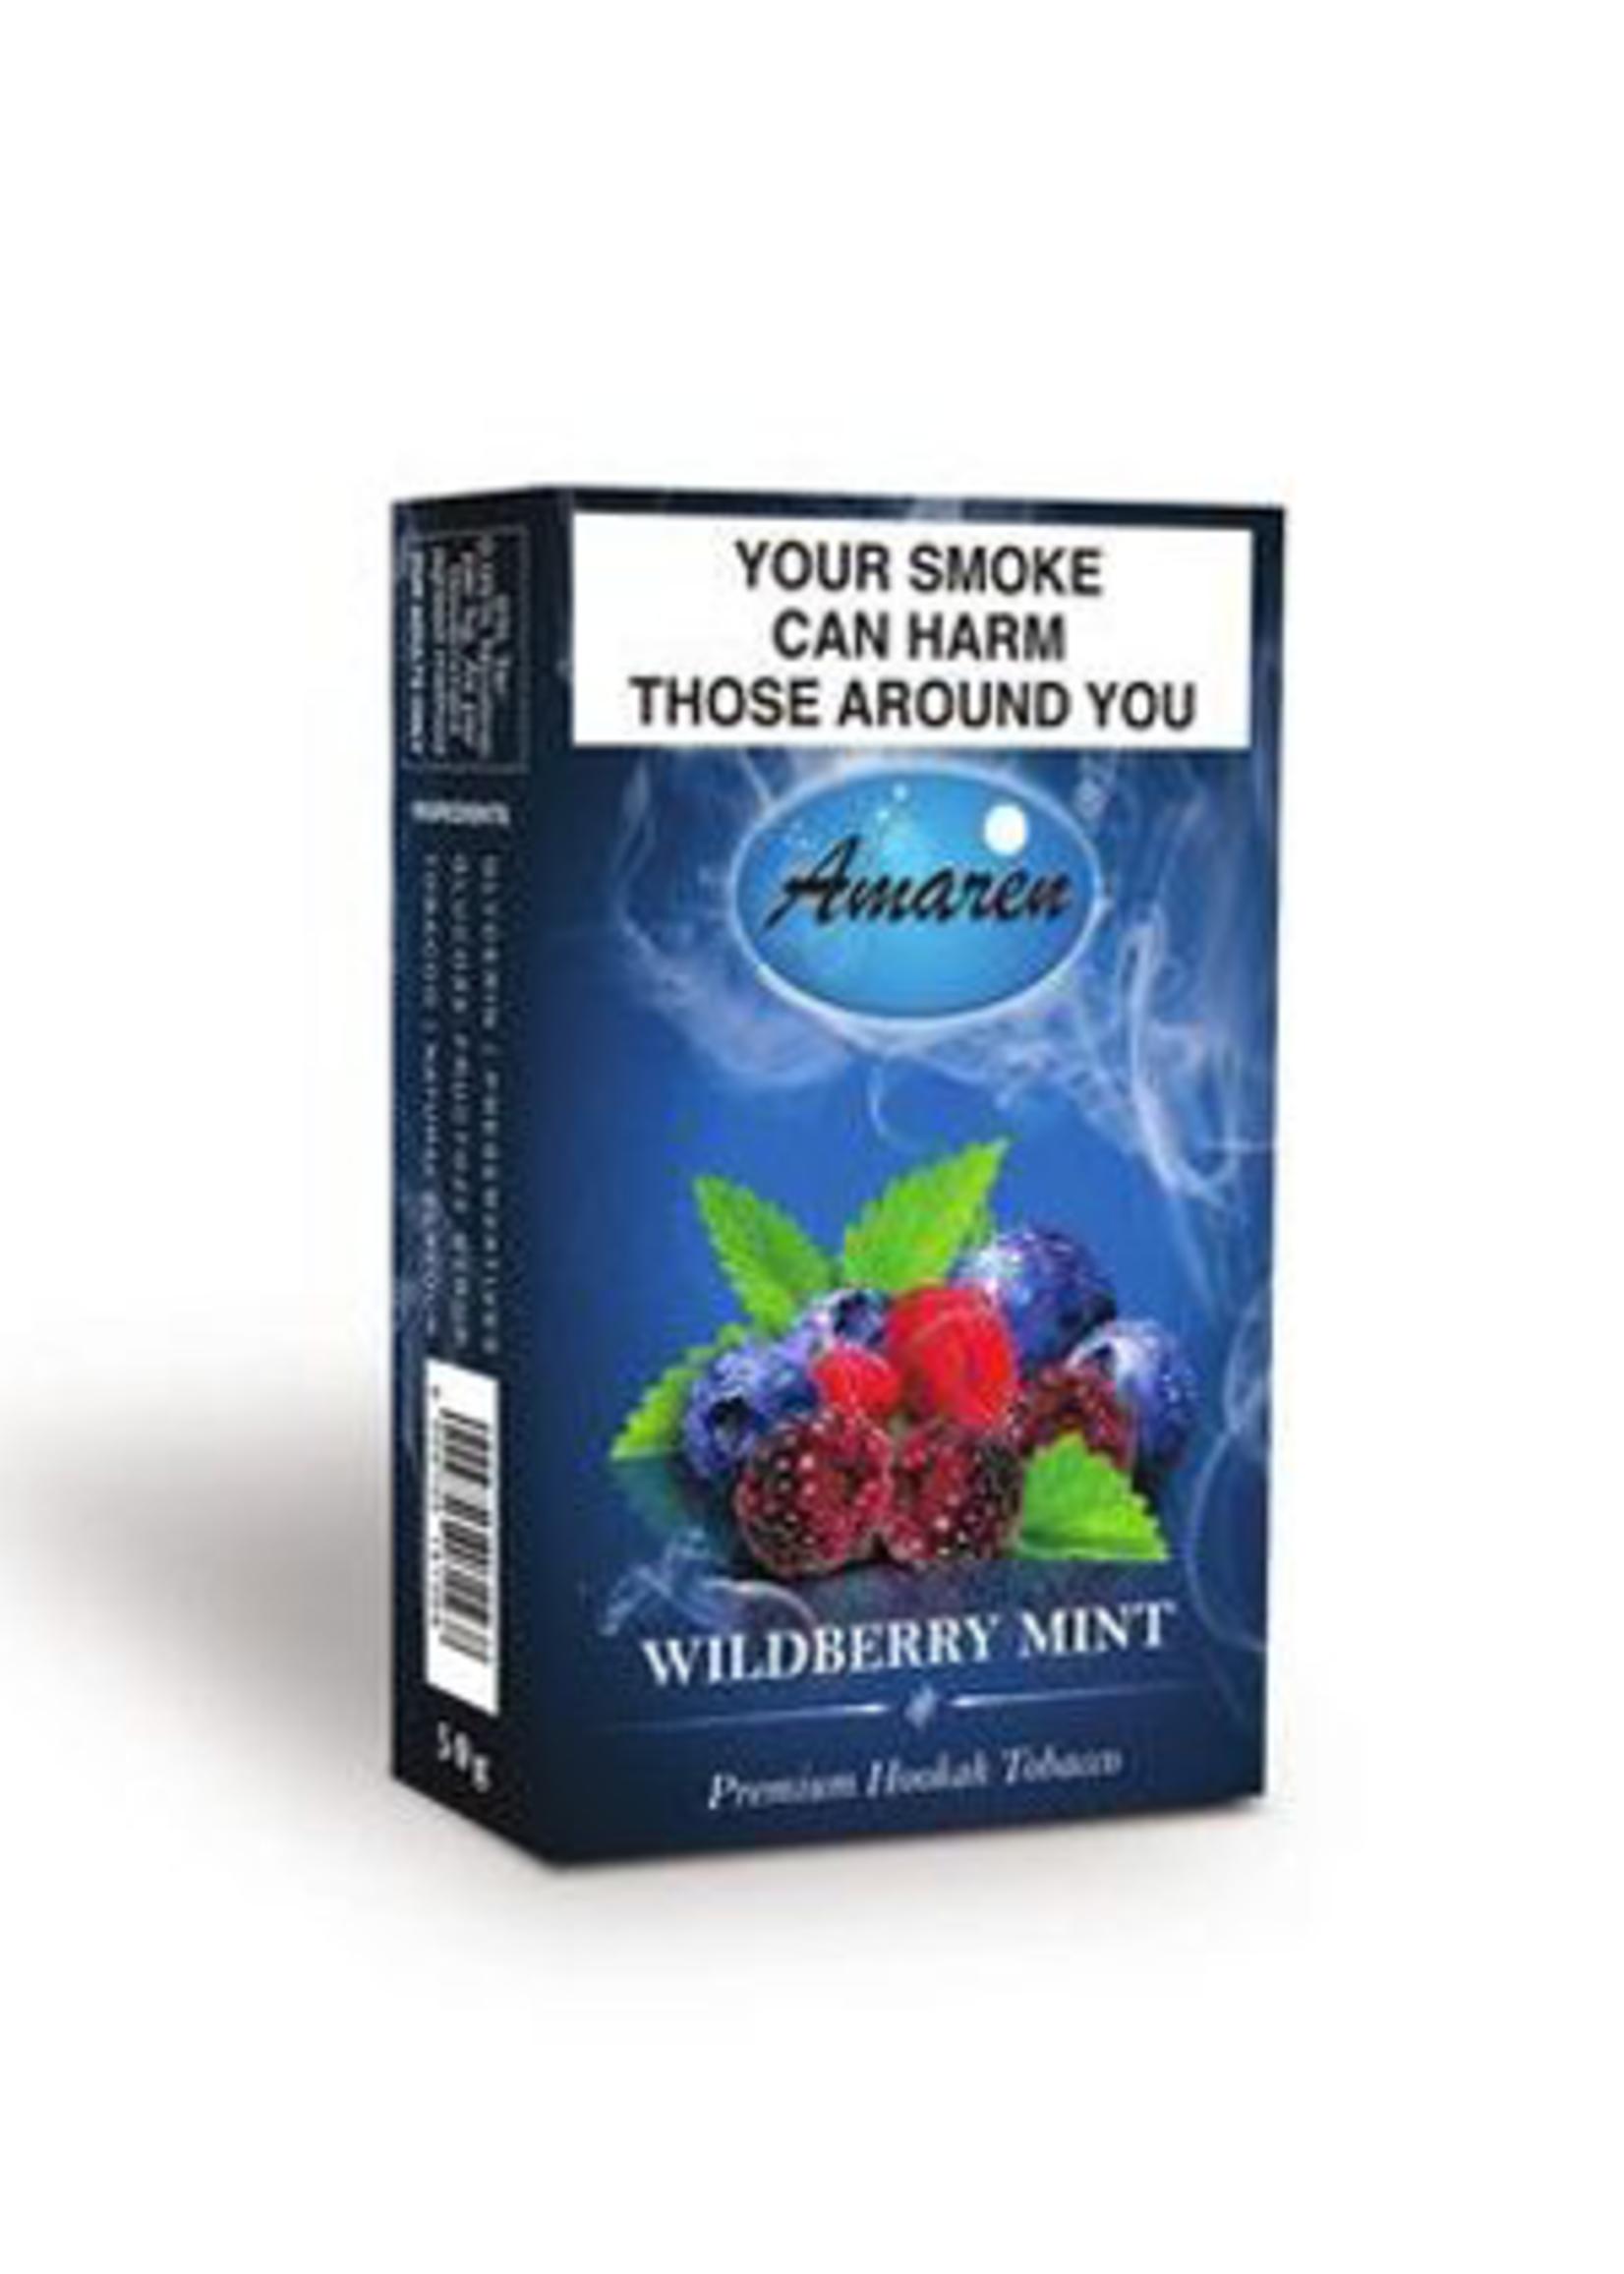 Amaren hubbly flavour - wildberry mint